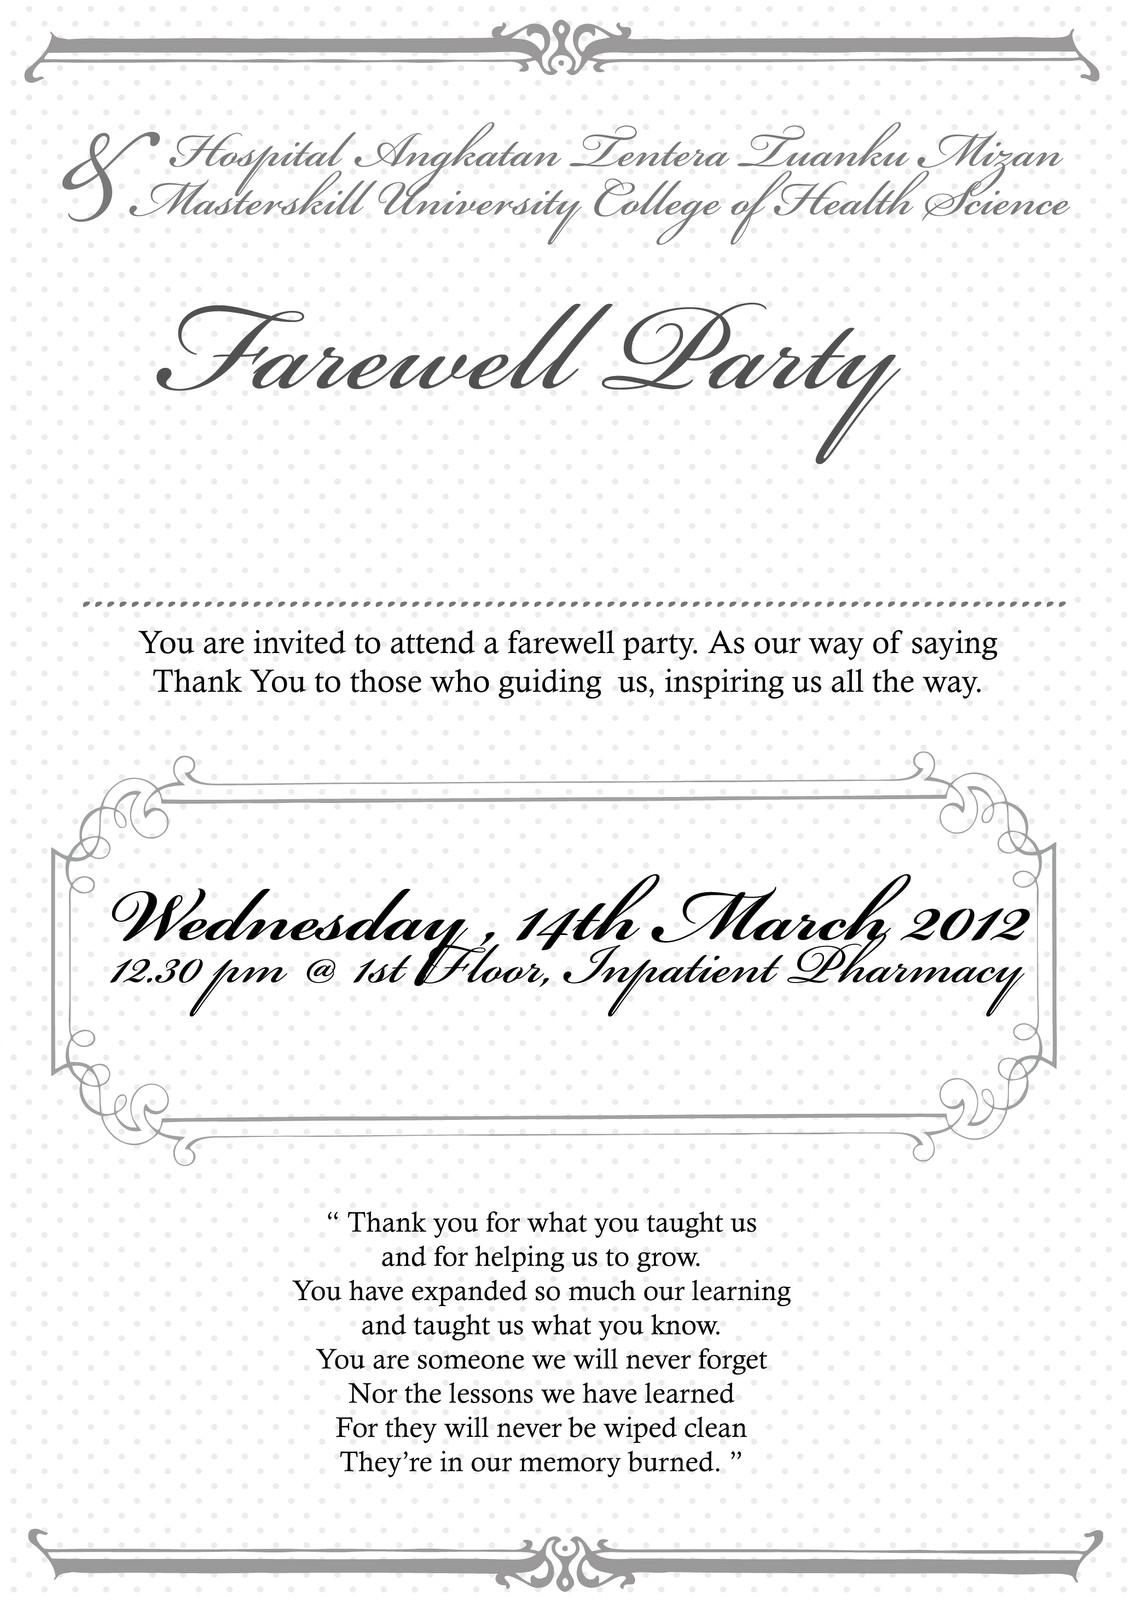 1638642430 invitation card farewel 2 png